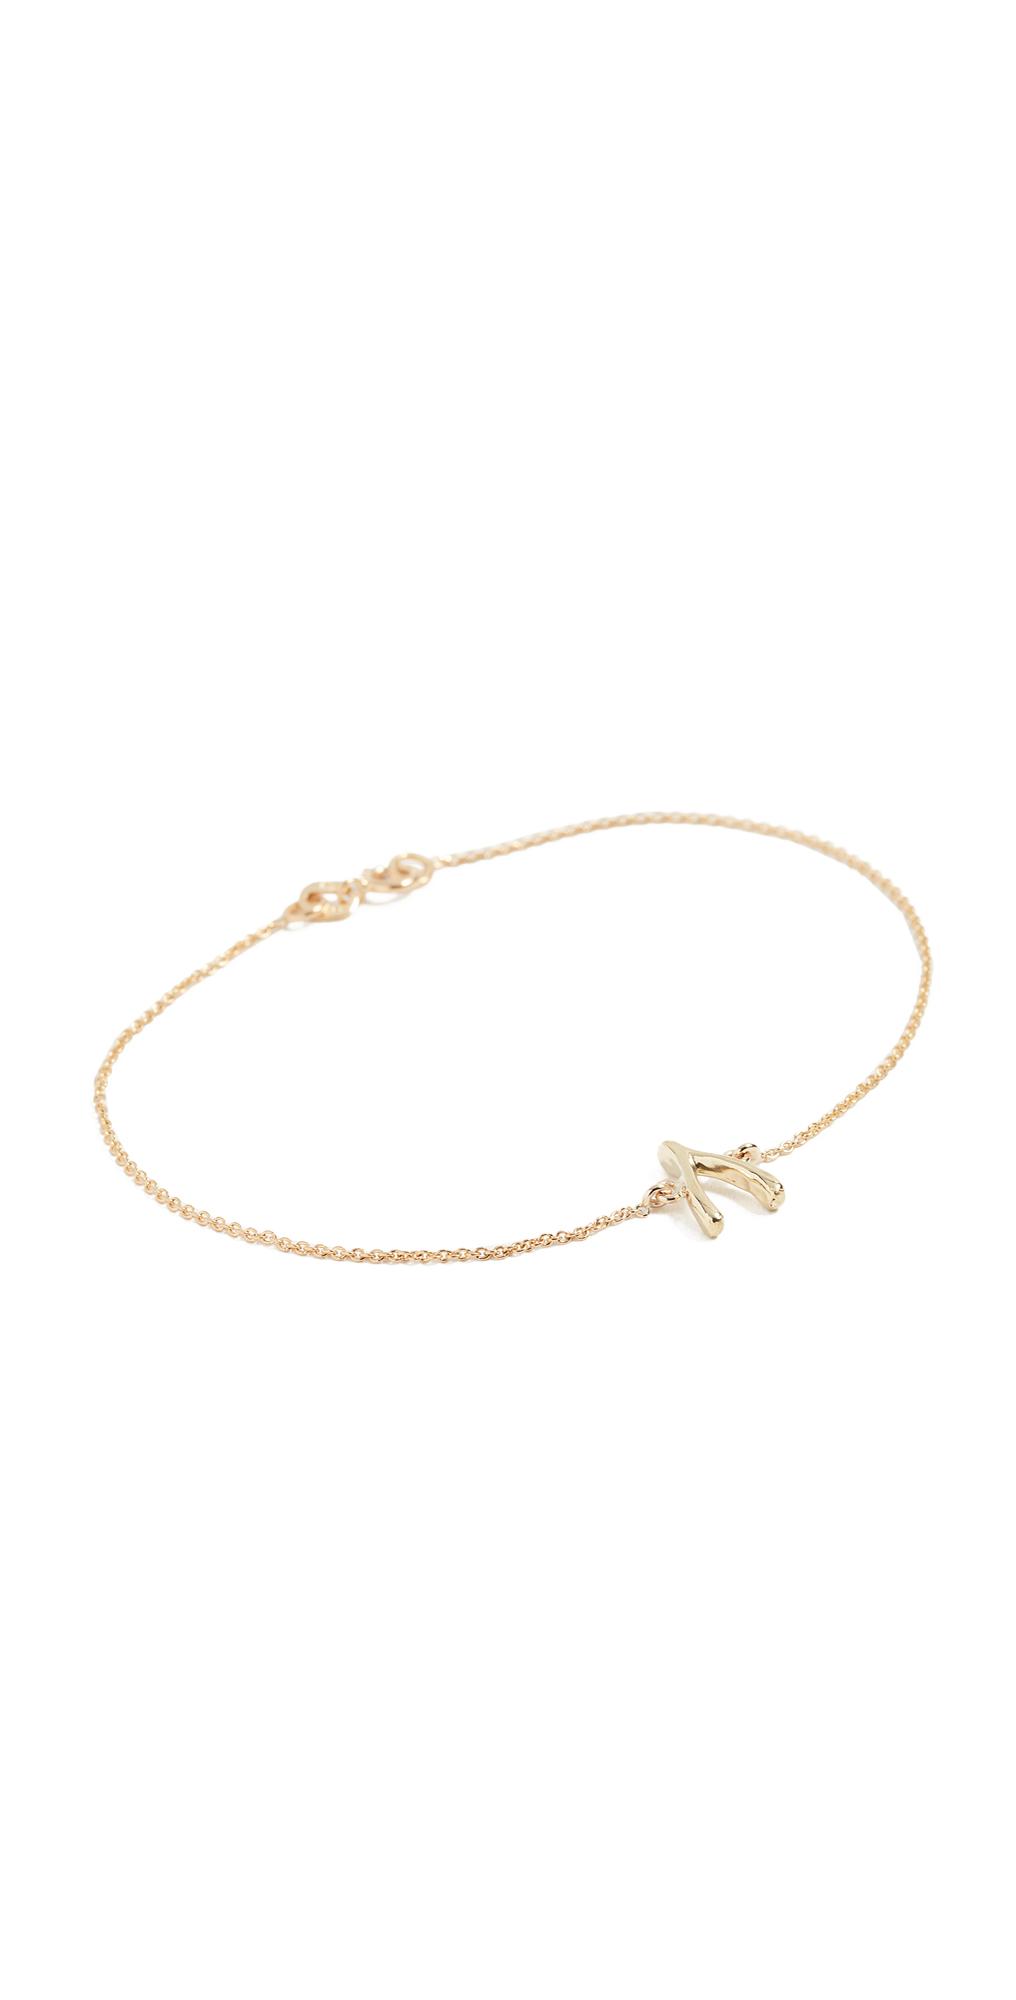 18k Gold Wishbone Bracelet